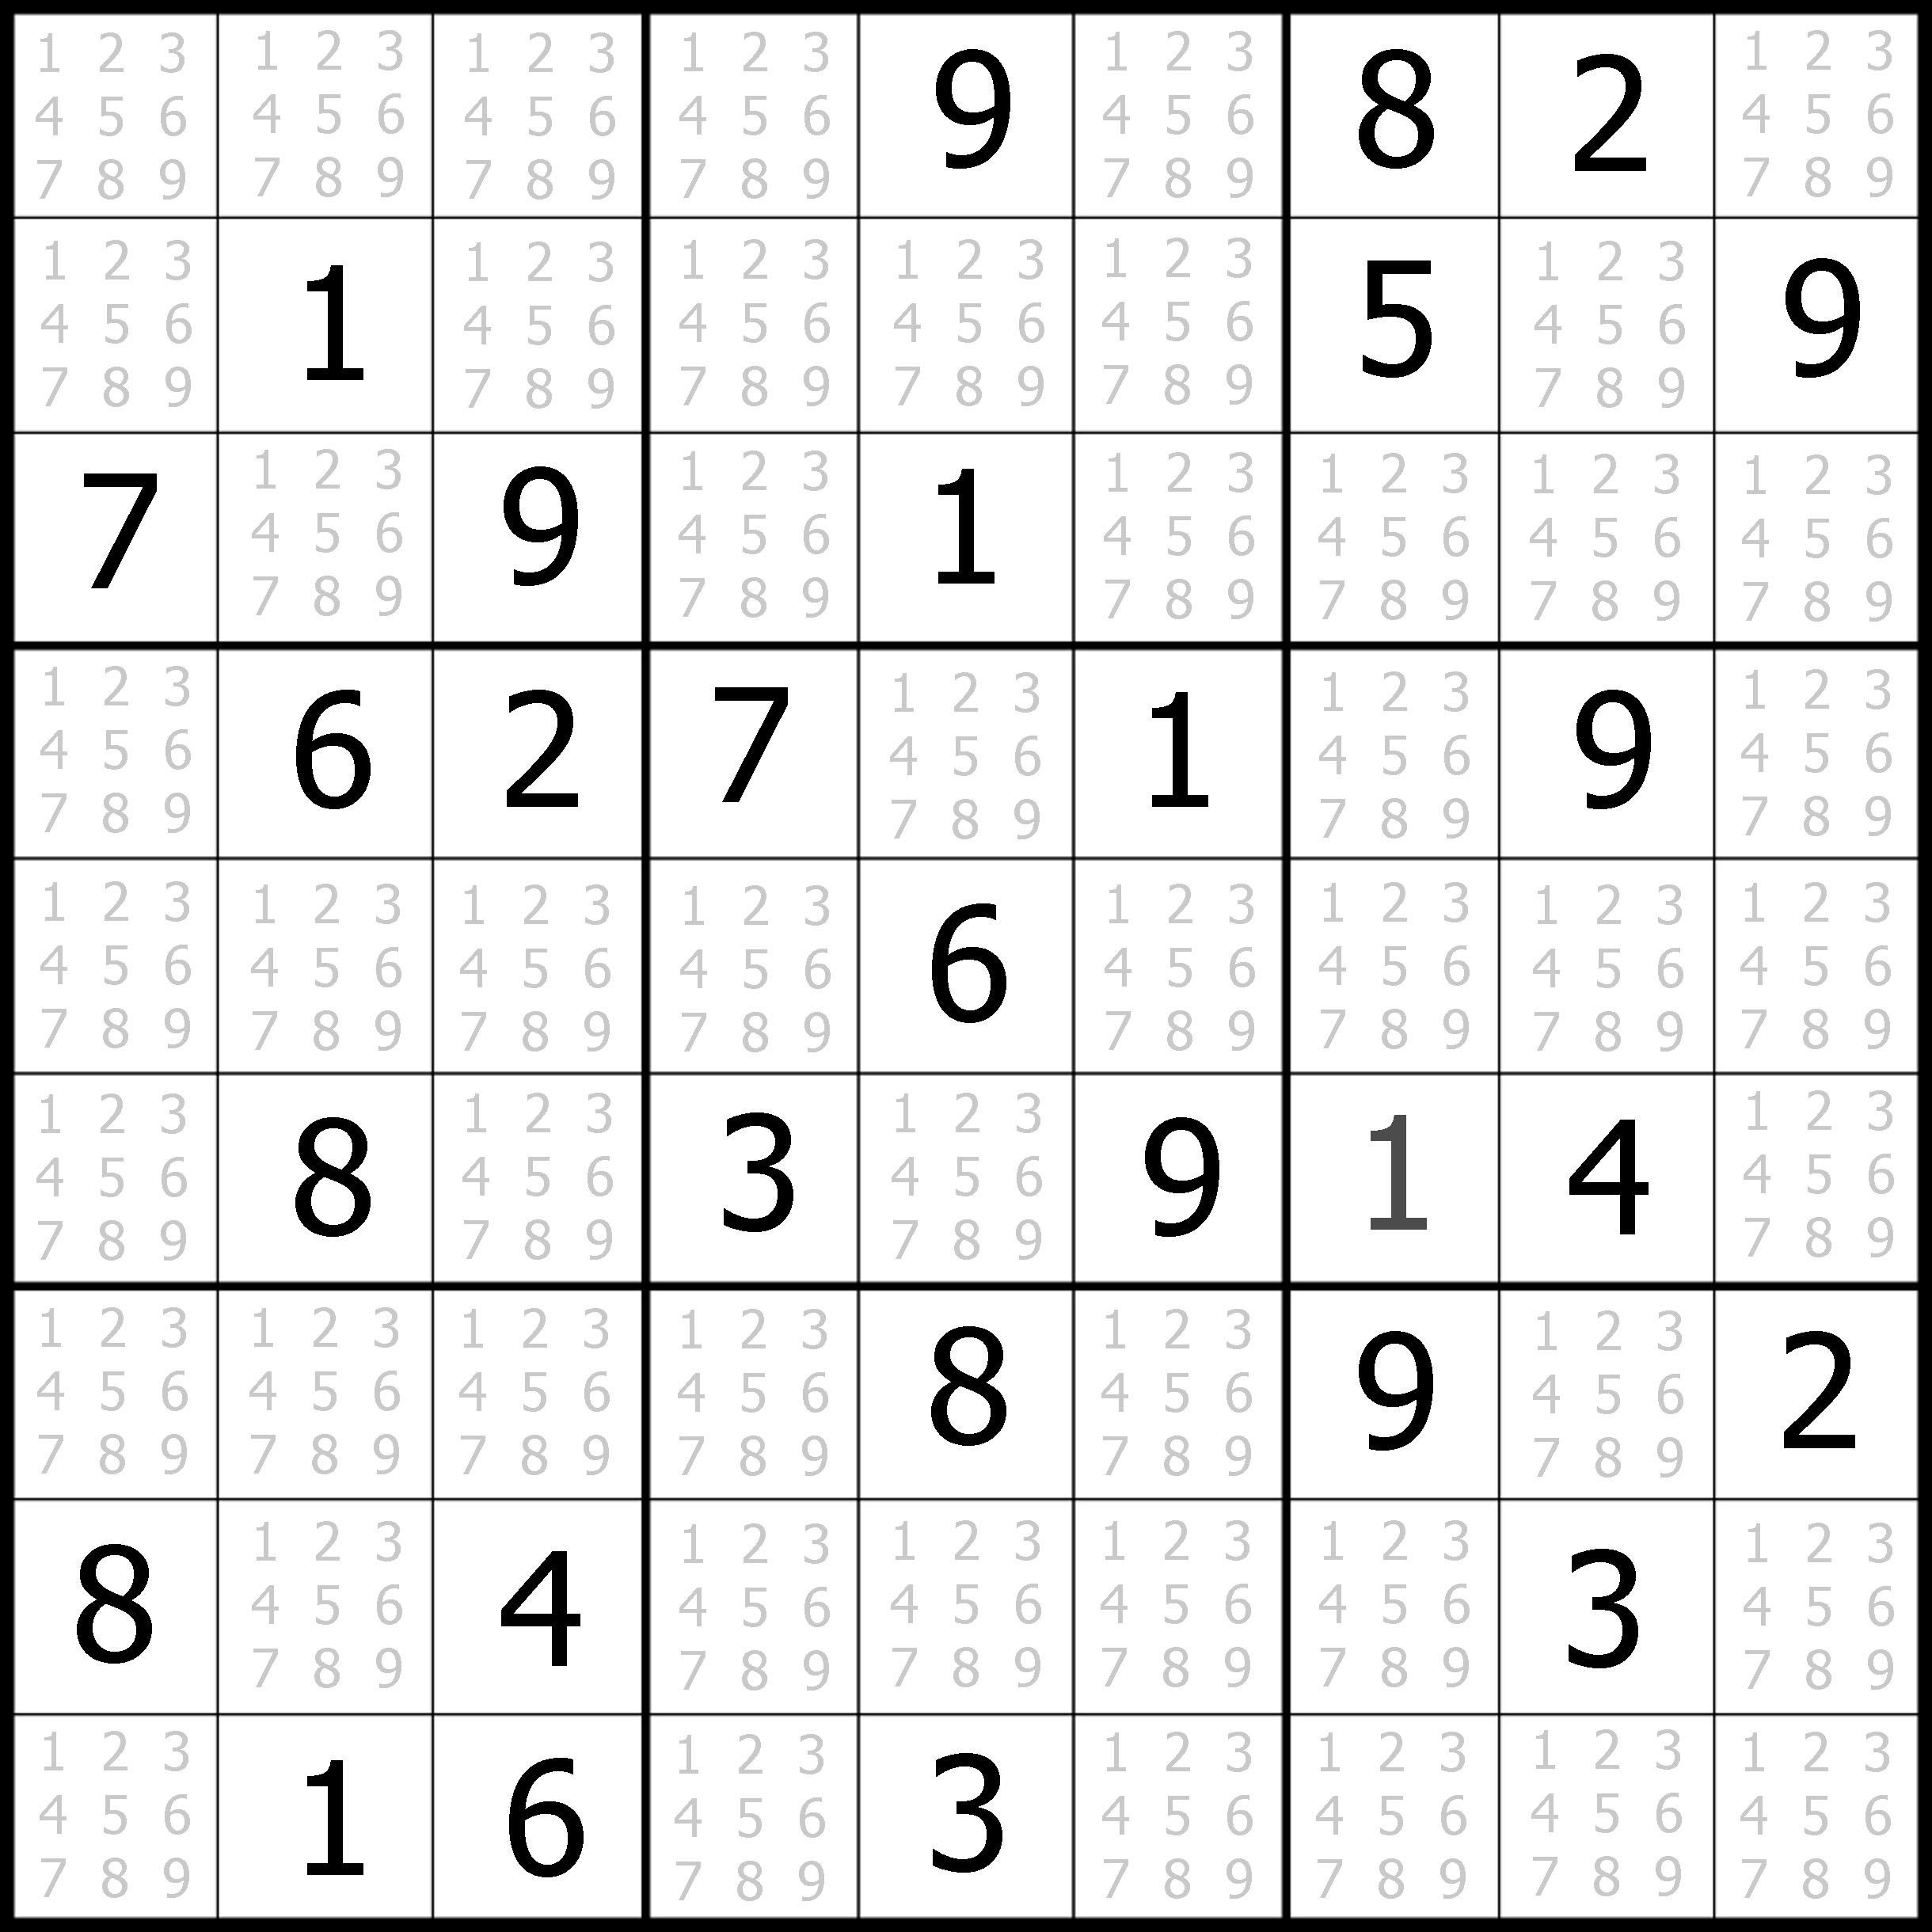 Sudoku Puzzler | Free, Printable, Updated Sudoku Puzzles With A - Printable Puzzles Sudoku